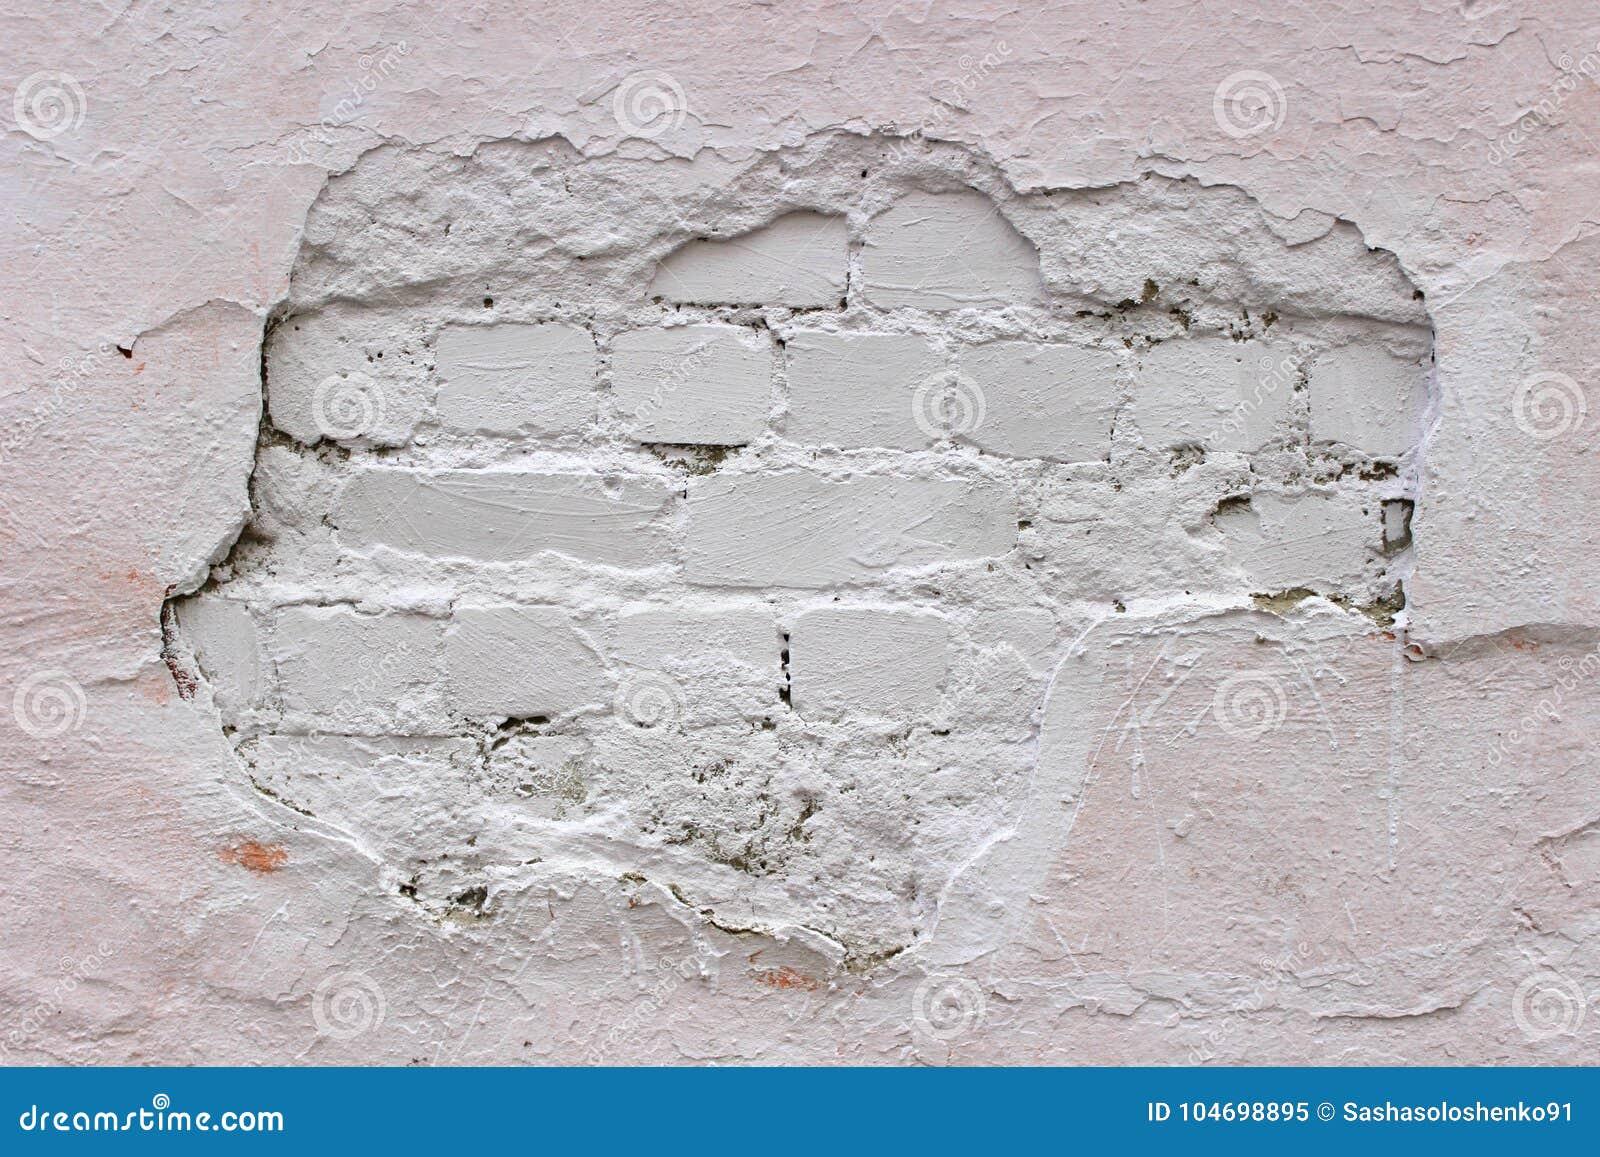 Stenen Muur Wit : Afbrokkelende bakstenen muur wit die pleister met verf wordt